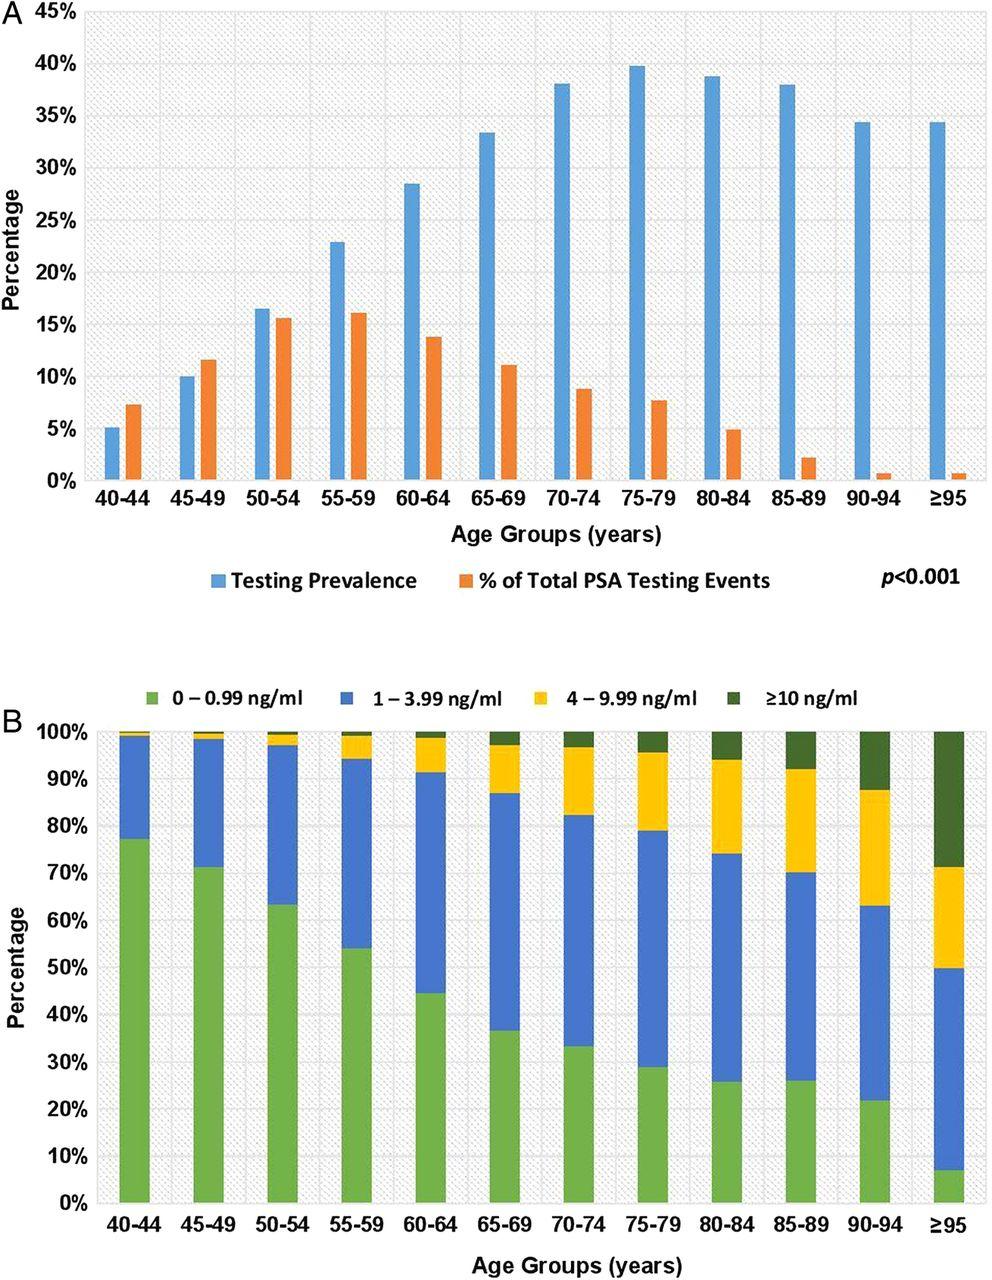 prostate-specific antigen testing in inner london general practices